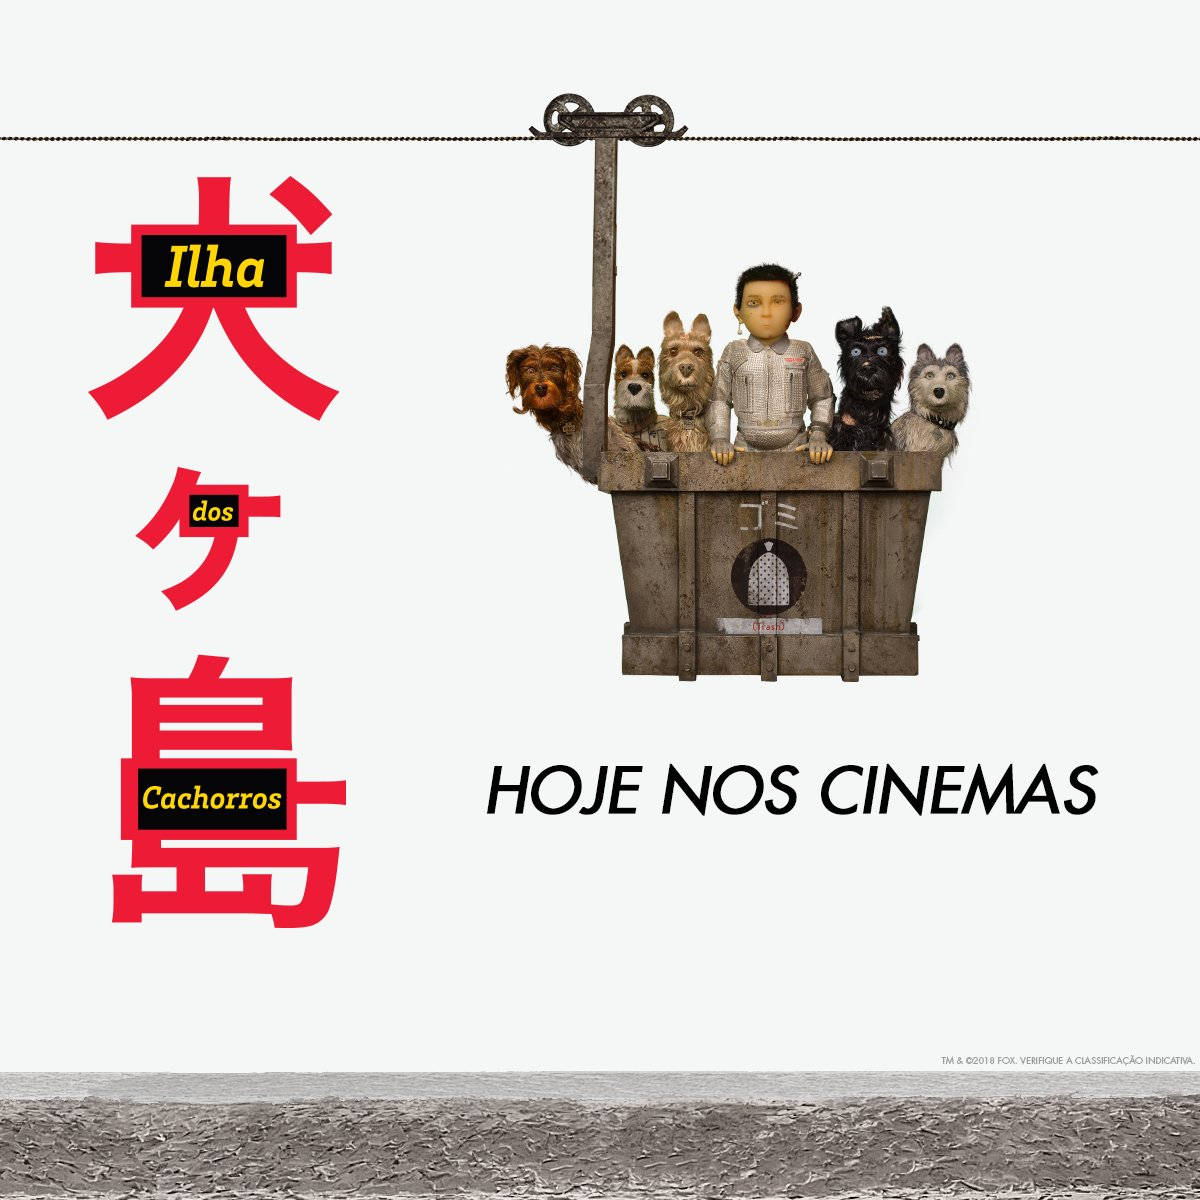 Circuito Cinemas : Confira o circuito completo e assista hoje nos cinemas sp